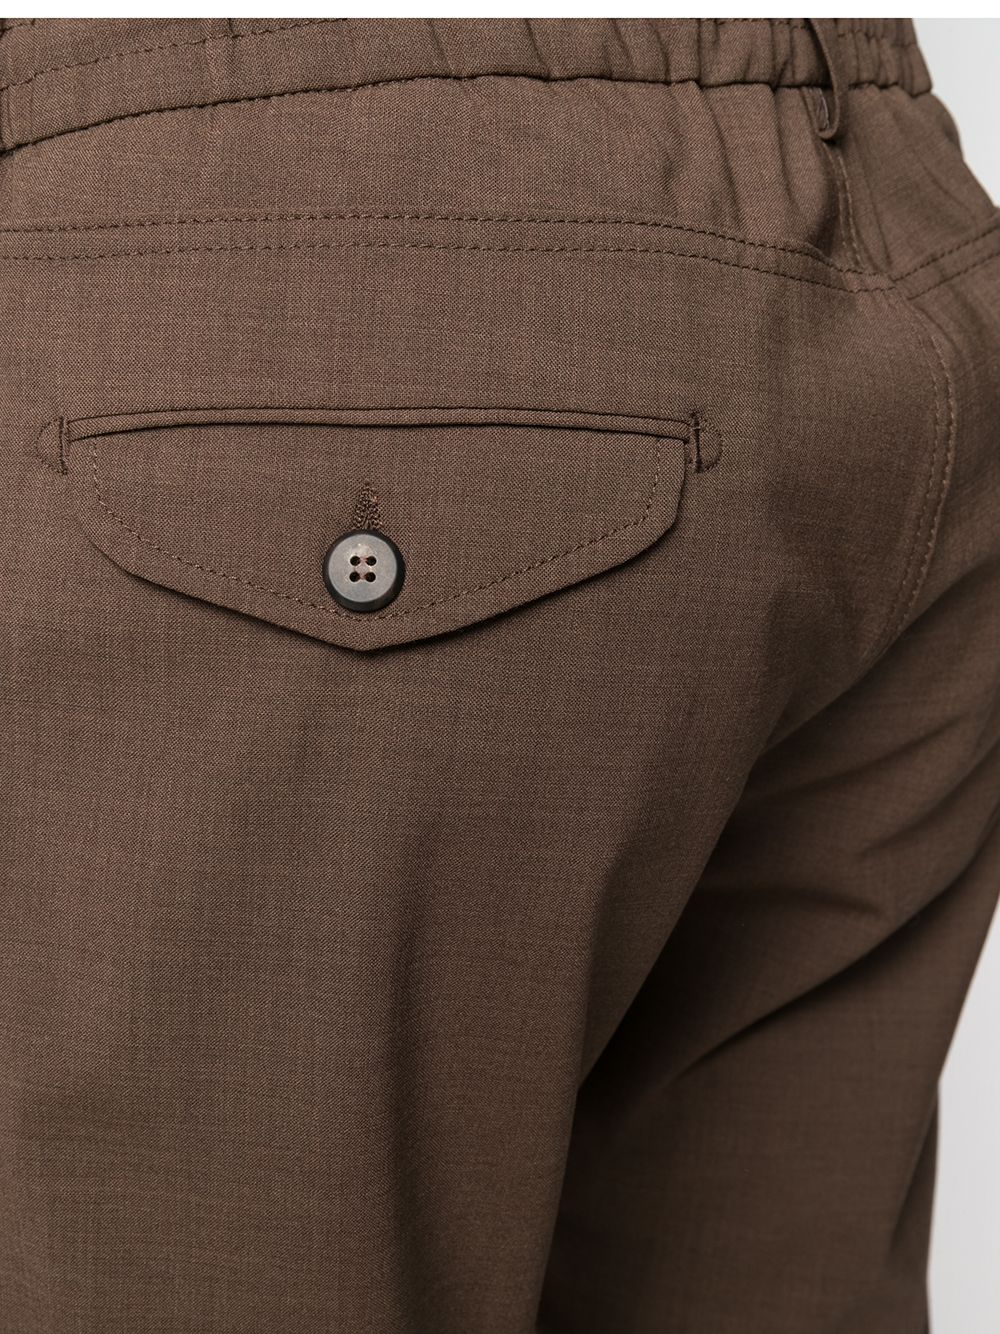 Pantaloni sartoriali marroni in misto lana con coulisse bianche ELEVENTY   Pantaloni   C75PANB21-TES0A05305